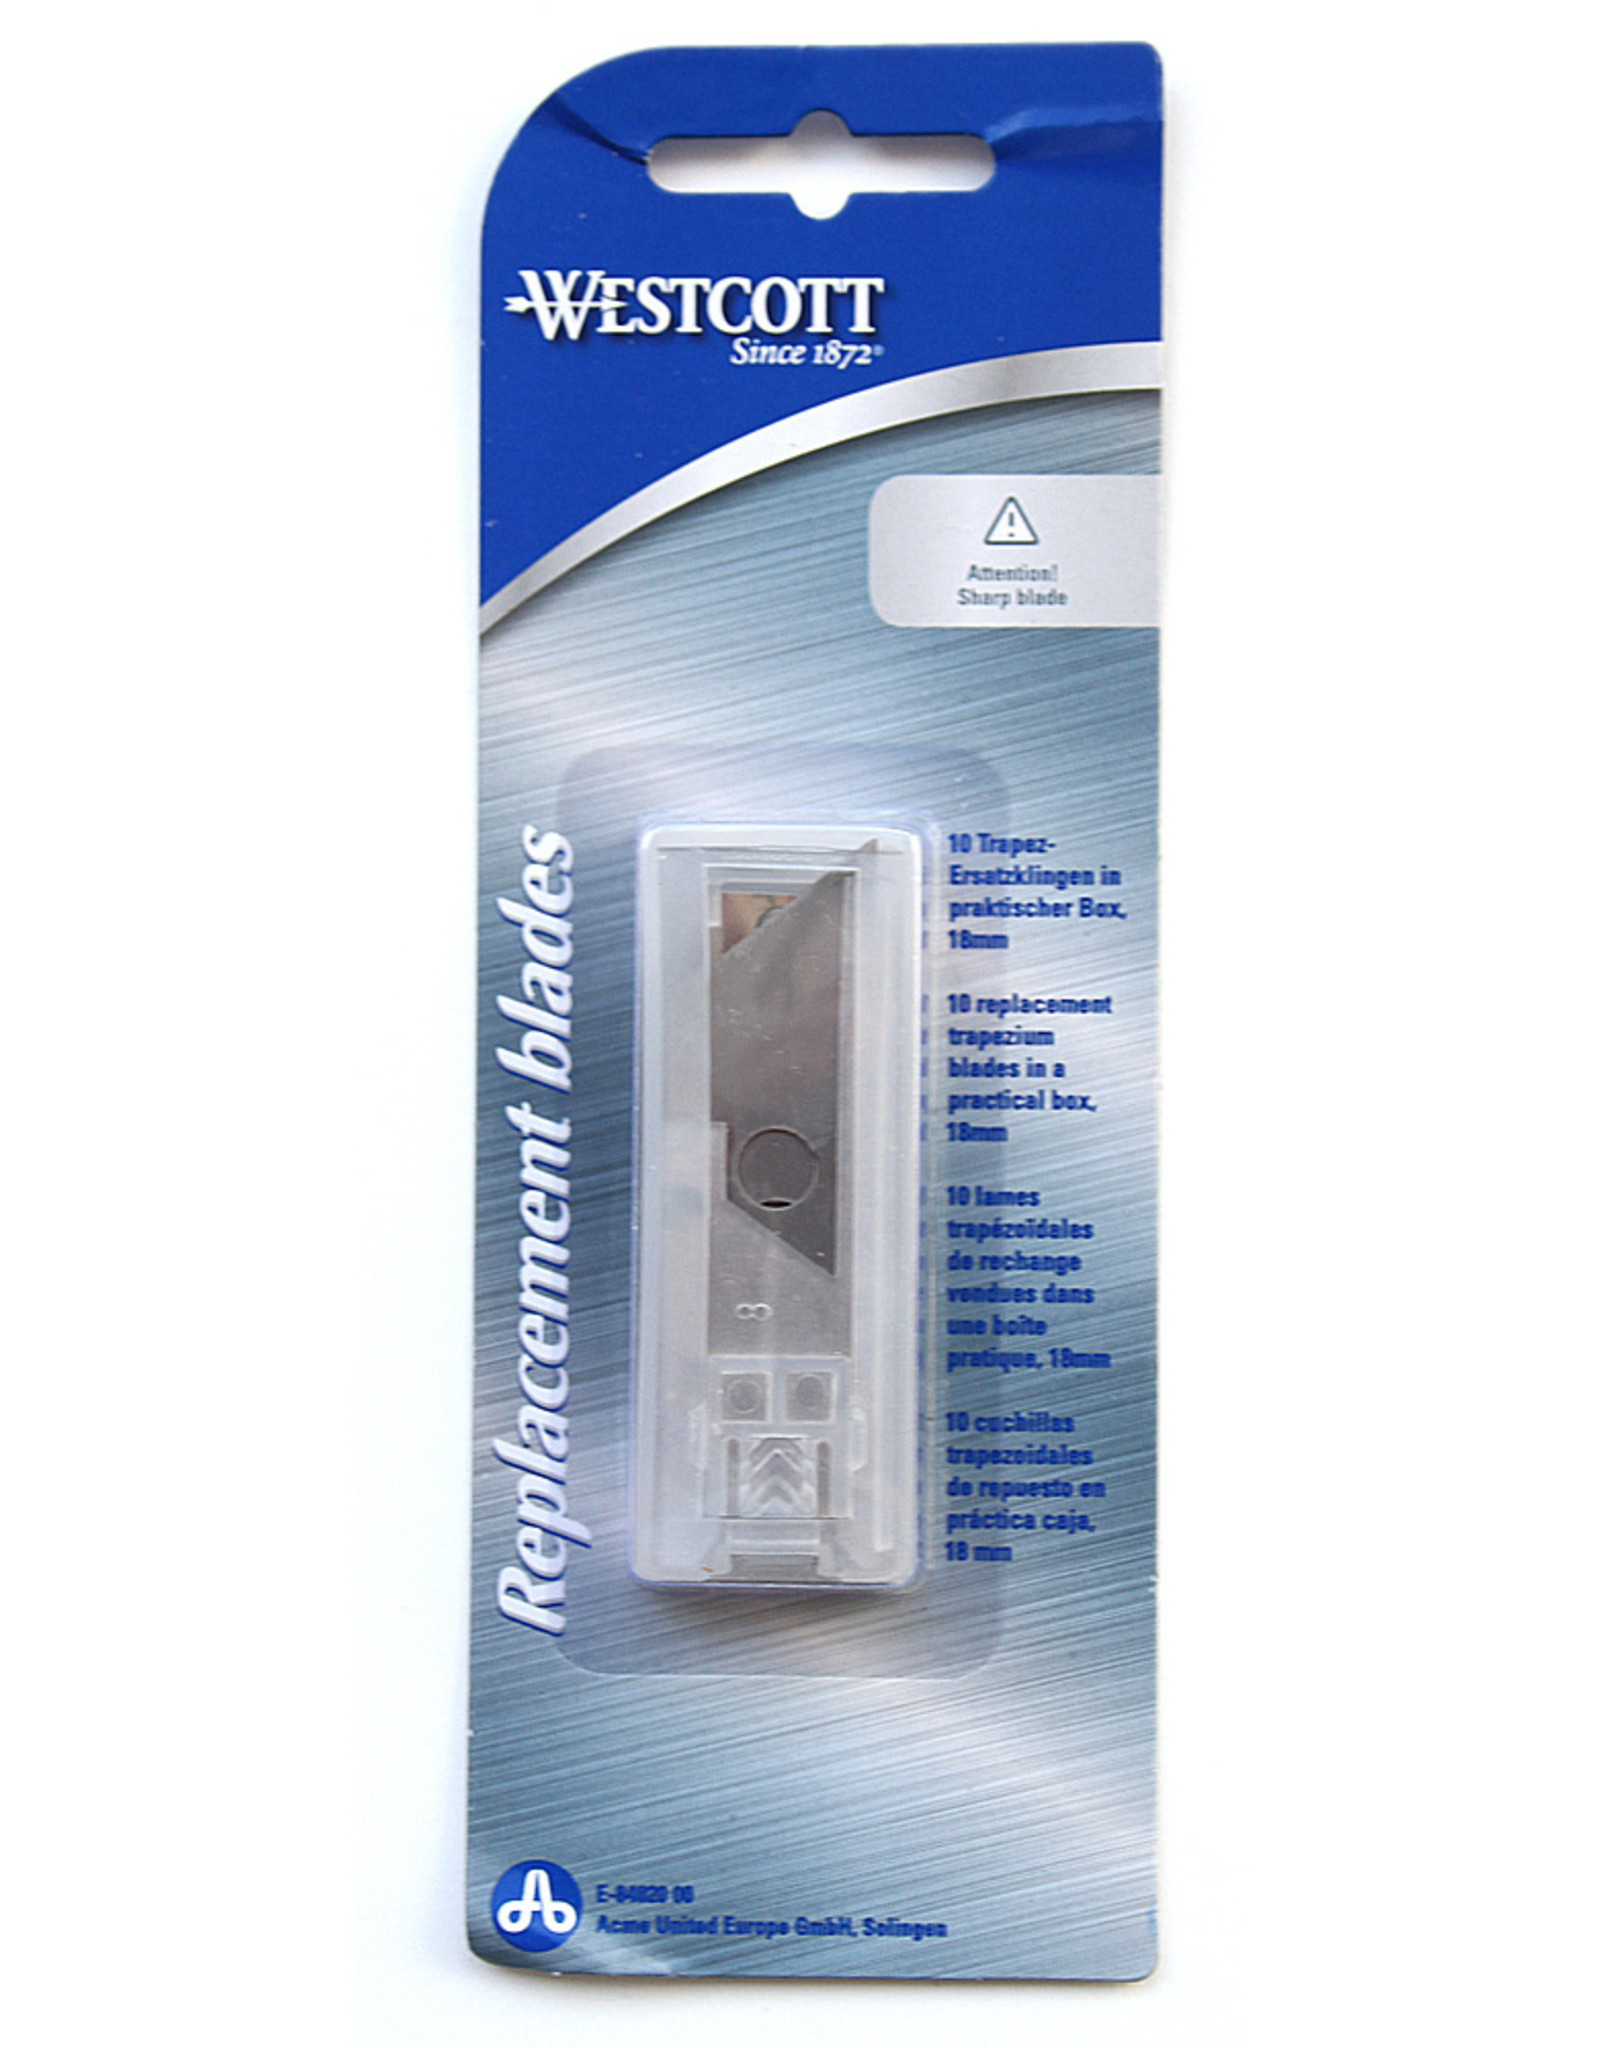 westcott 10x reservemesjes Westcott voor Stanley-mes